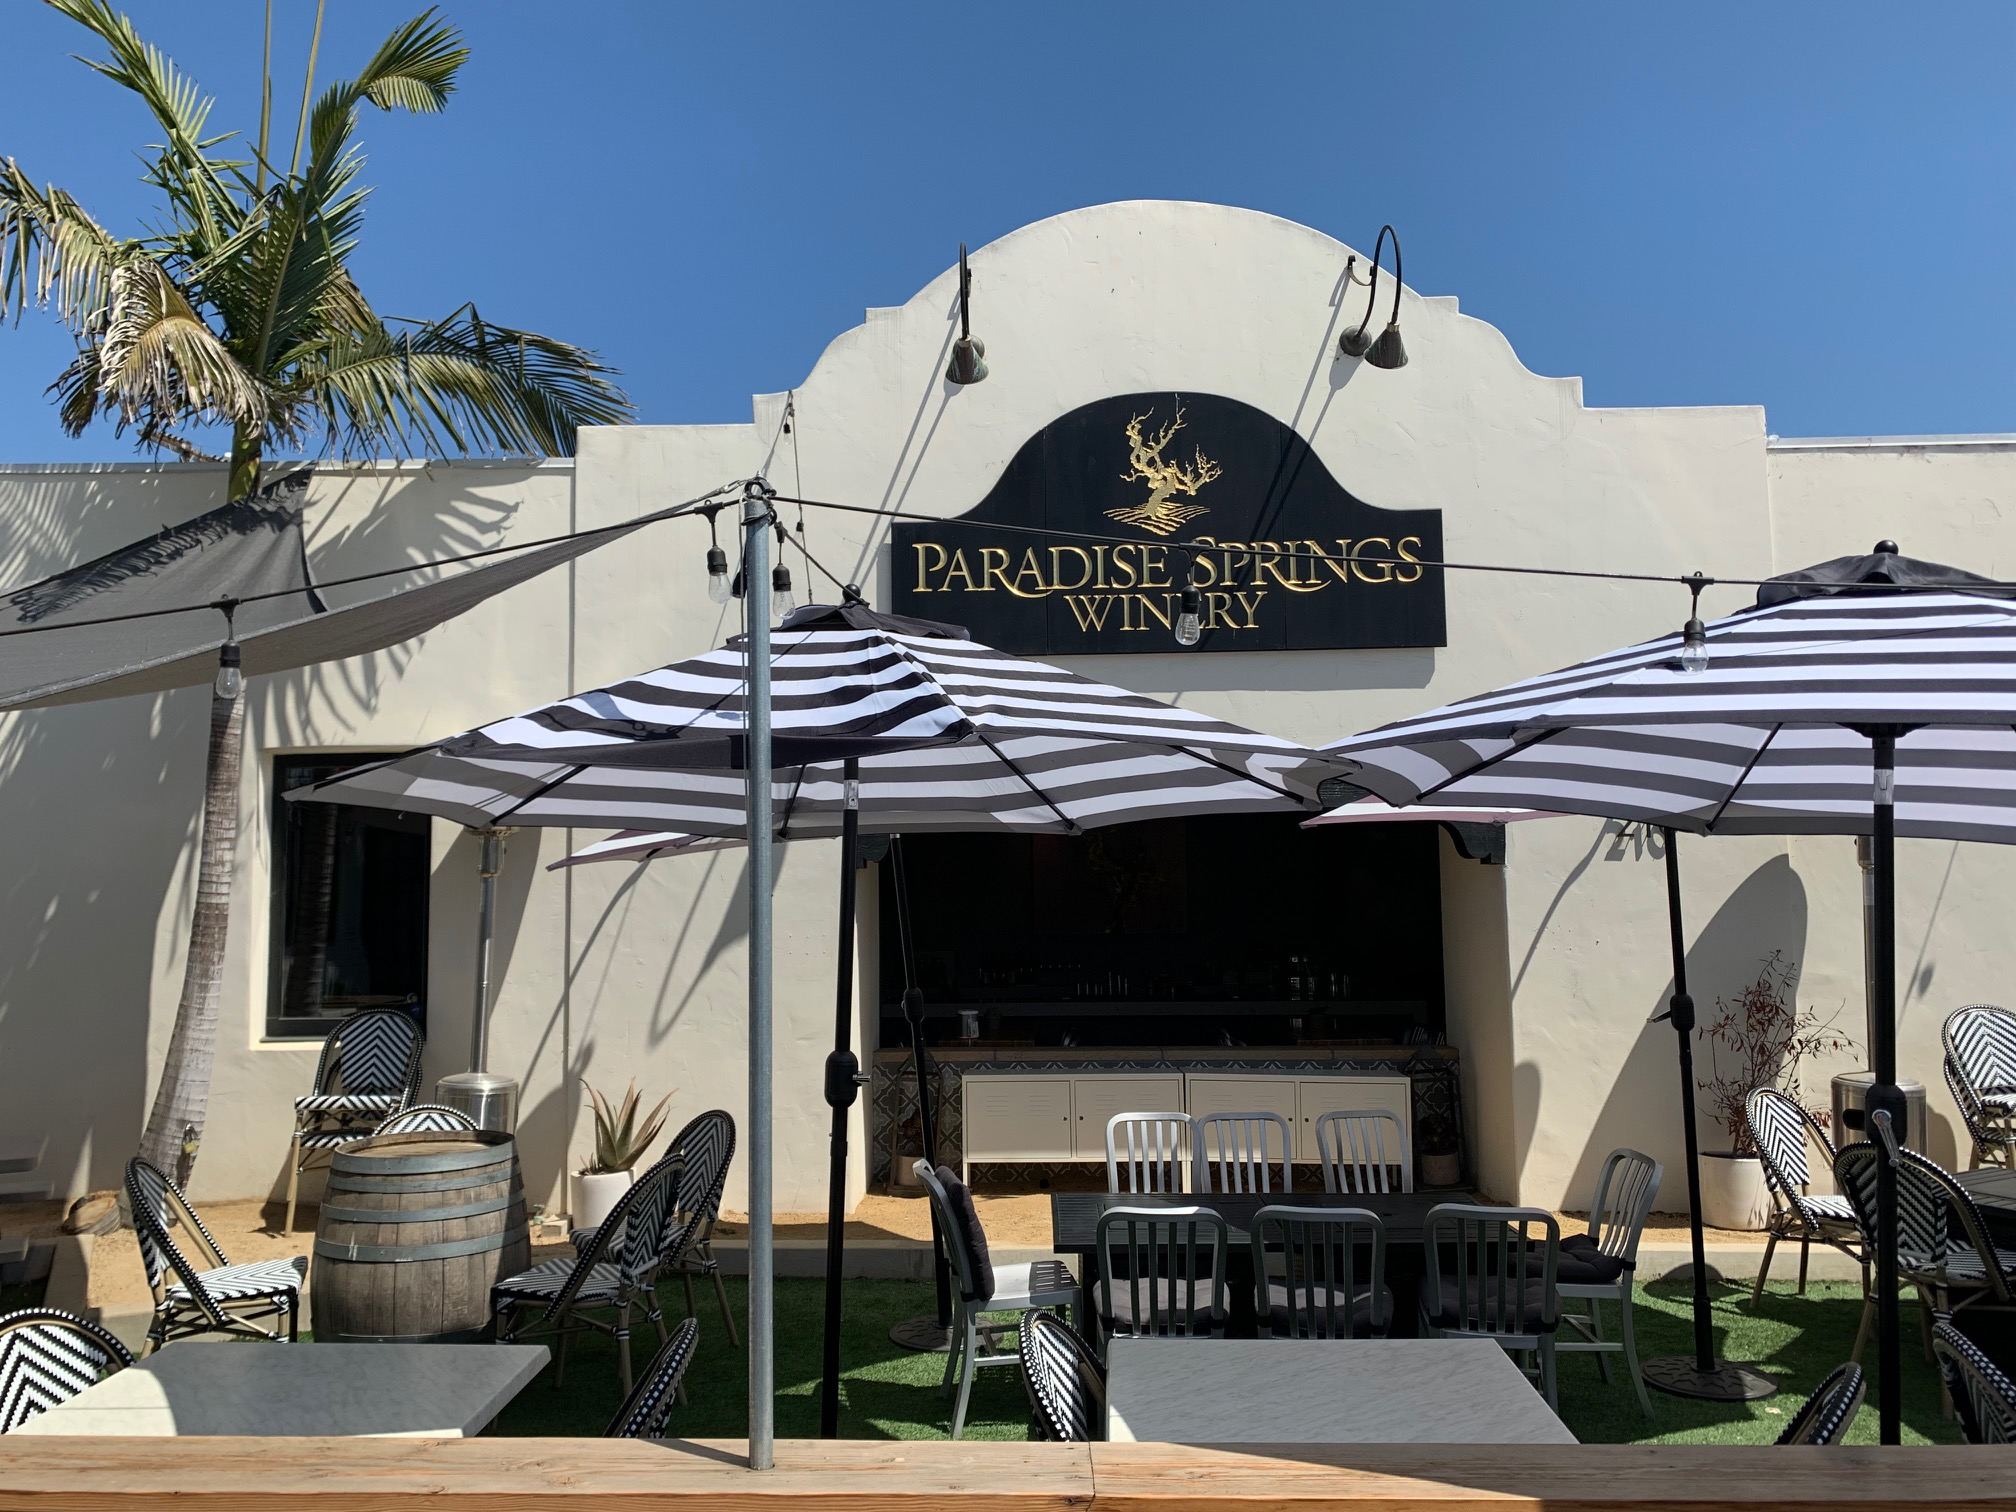 Paradise Springs Winery in Santa Barbara, CA